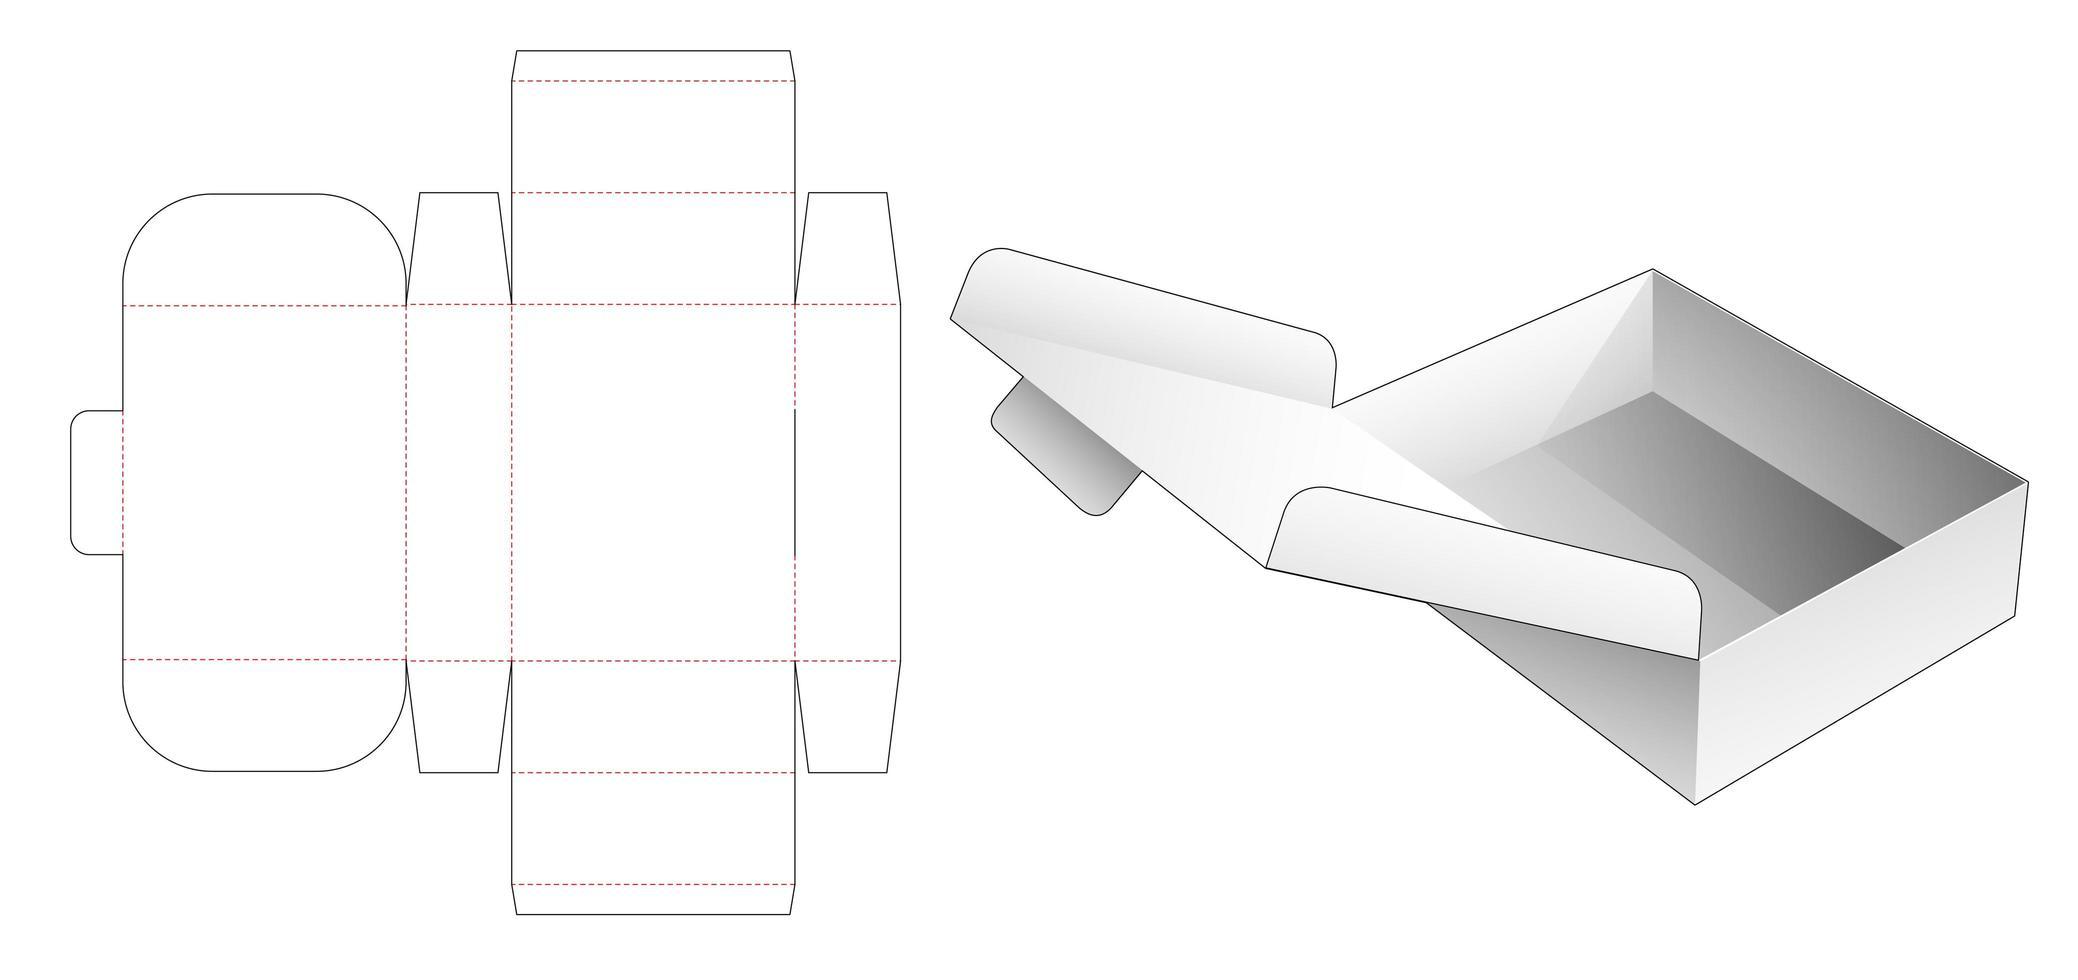 Klappbare Flipbox vektor